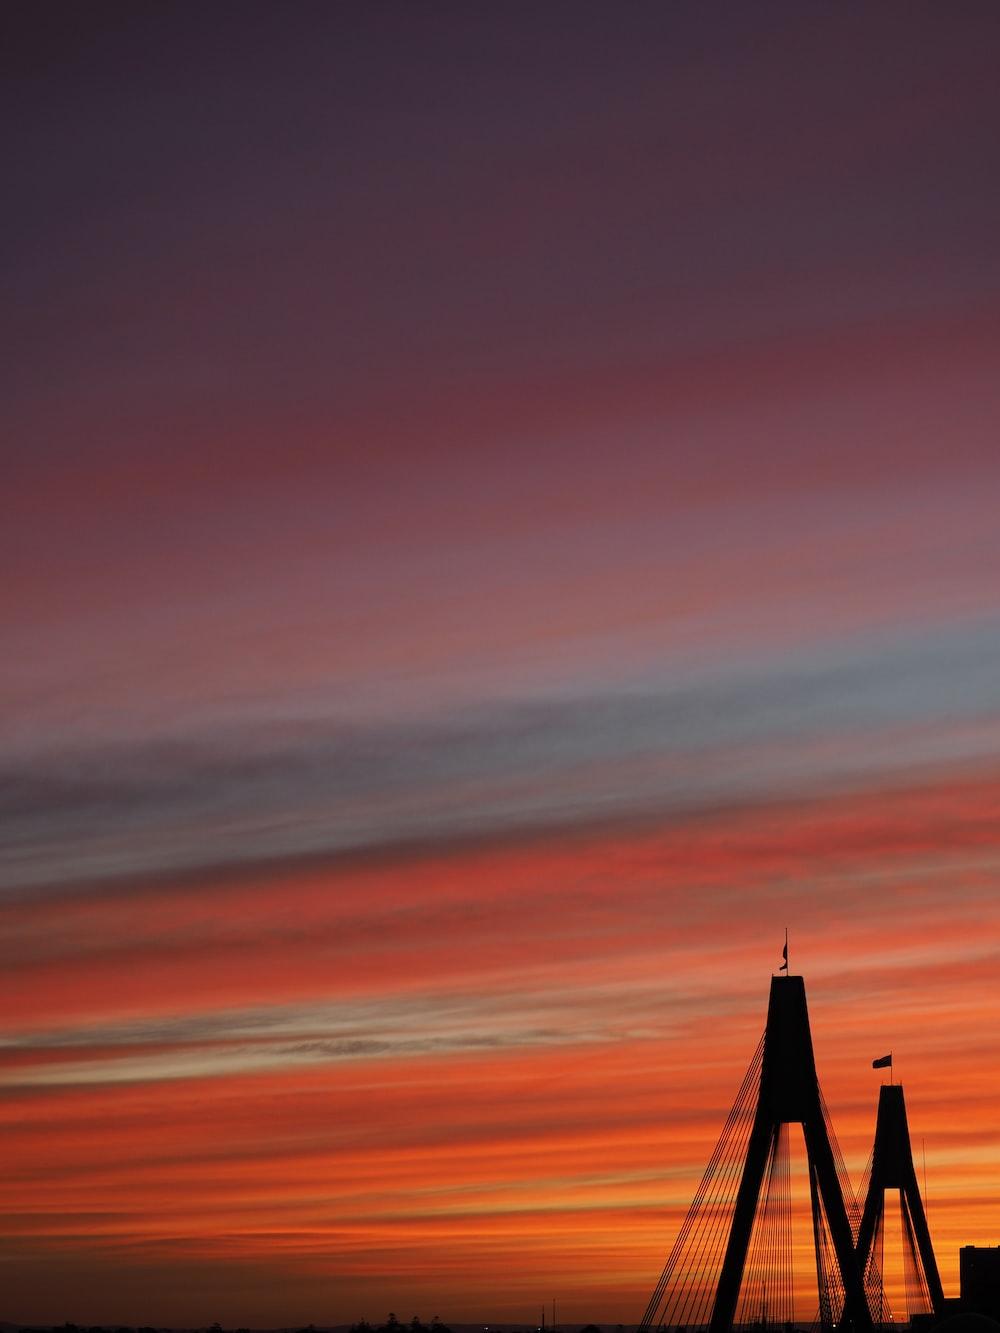 sunset photography